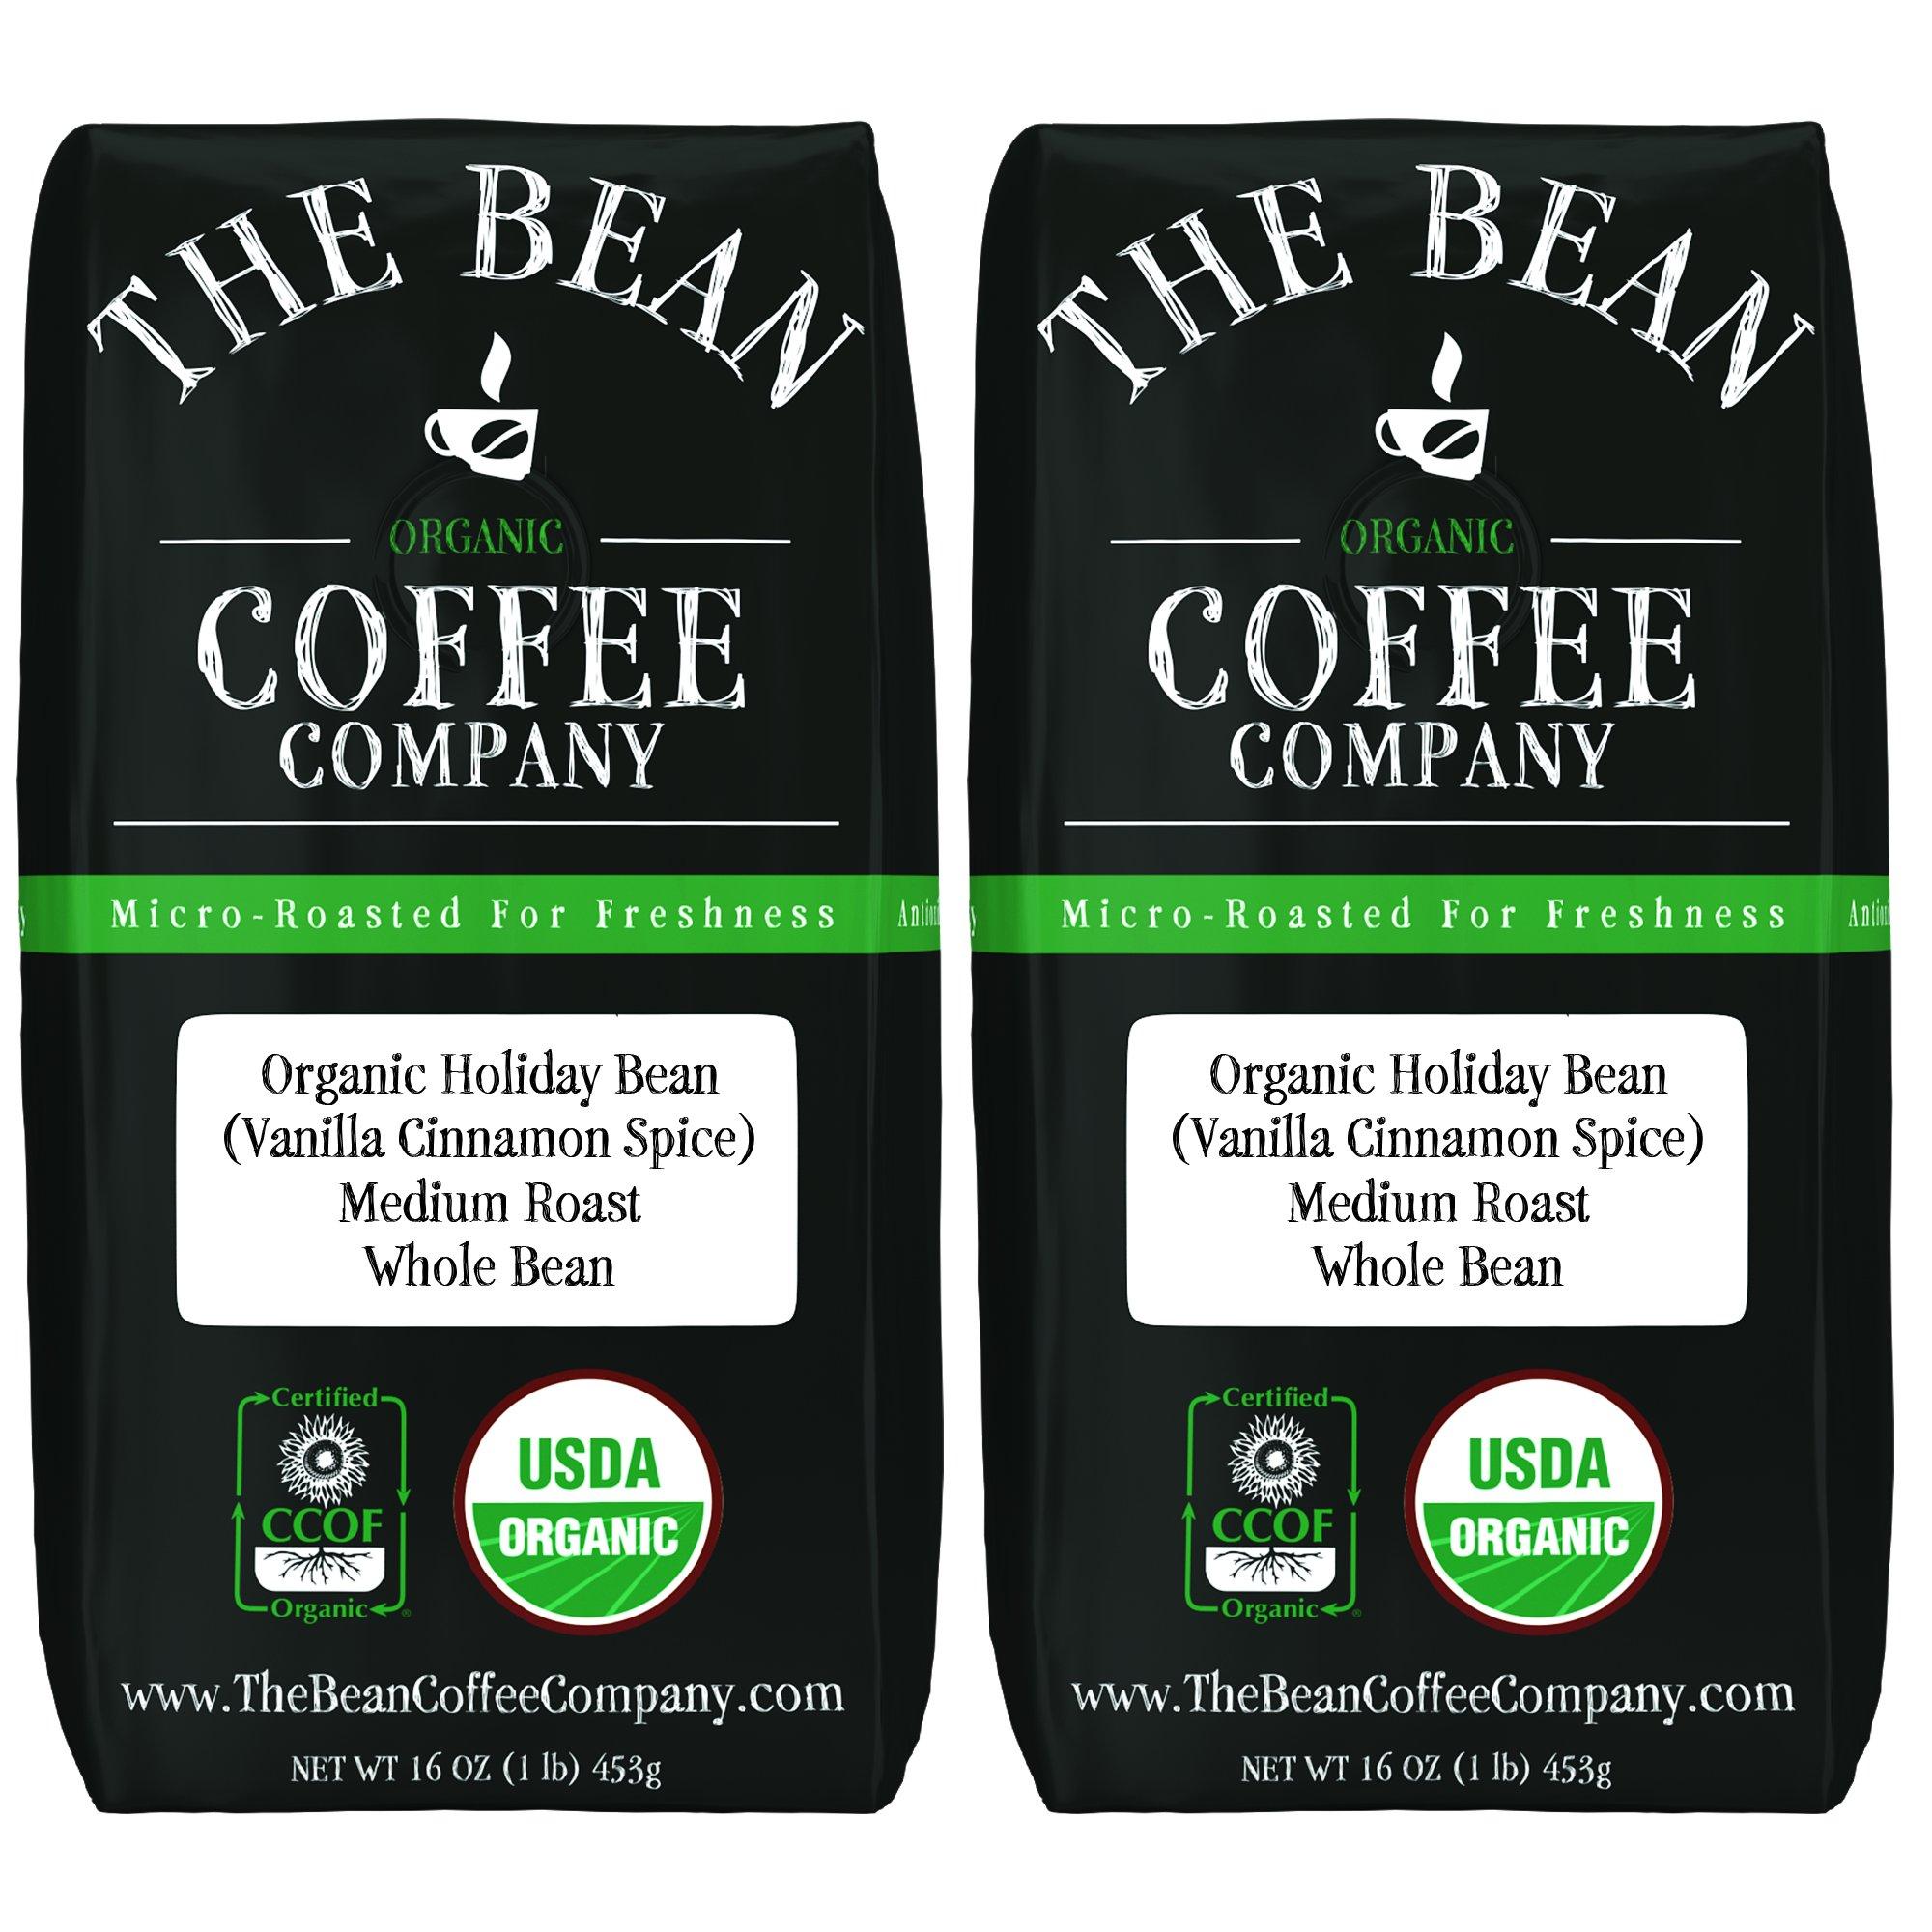 The Bean Coffee Company Organic Holiday Bean (Vanilla Cinnamon Spice), Medium Roast, Whole Bean, 16-Ounce Bags (Pack of 2)